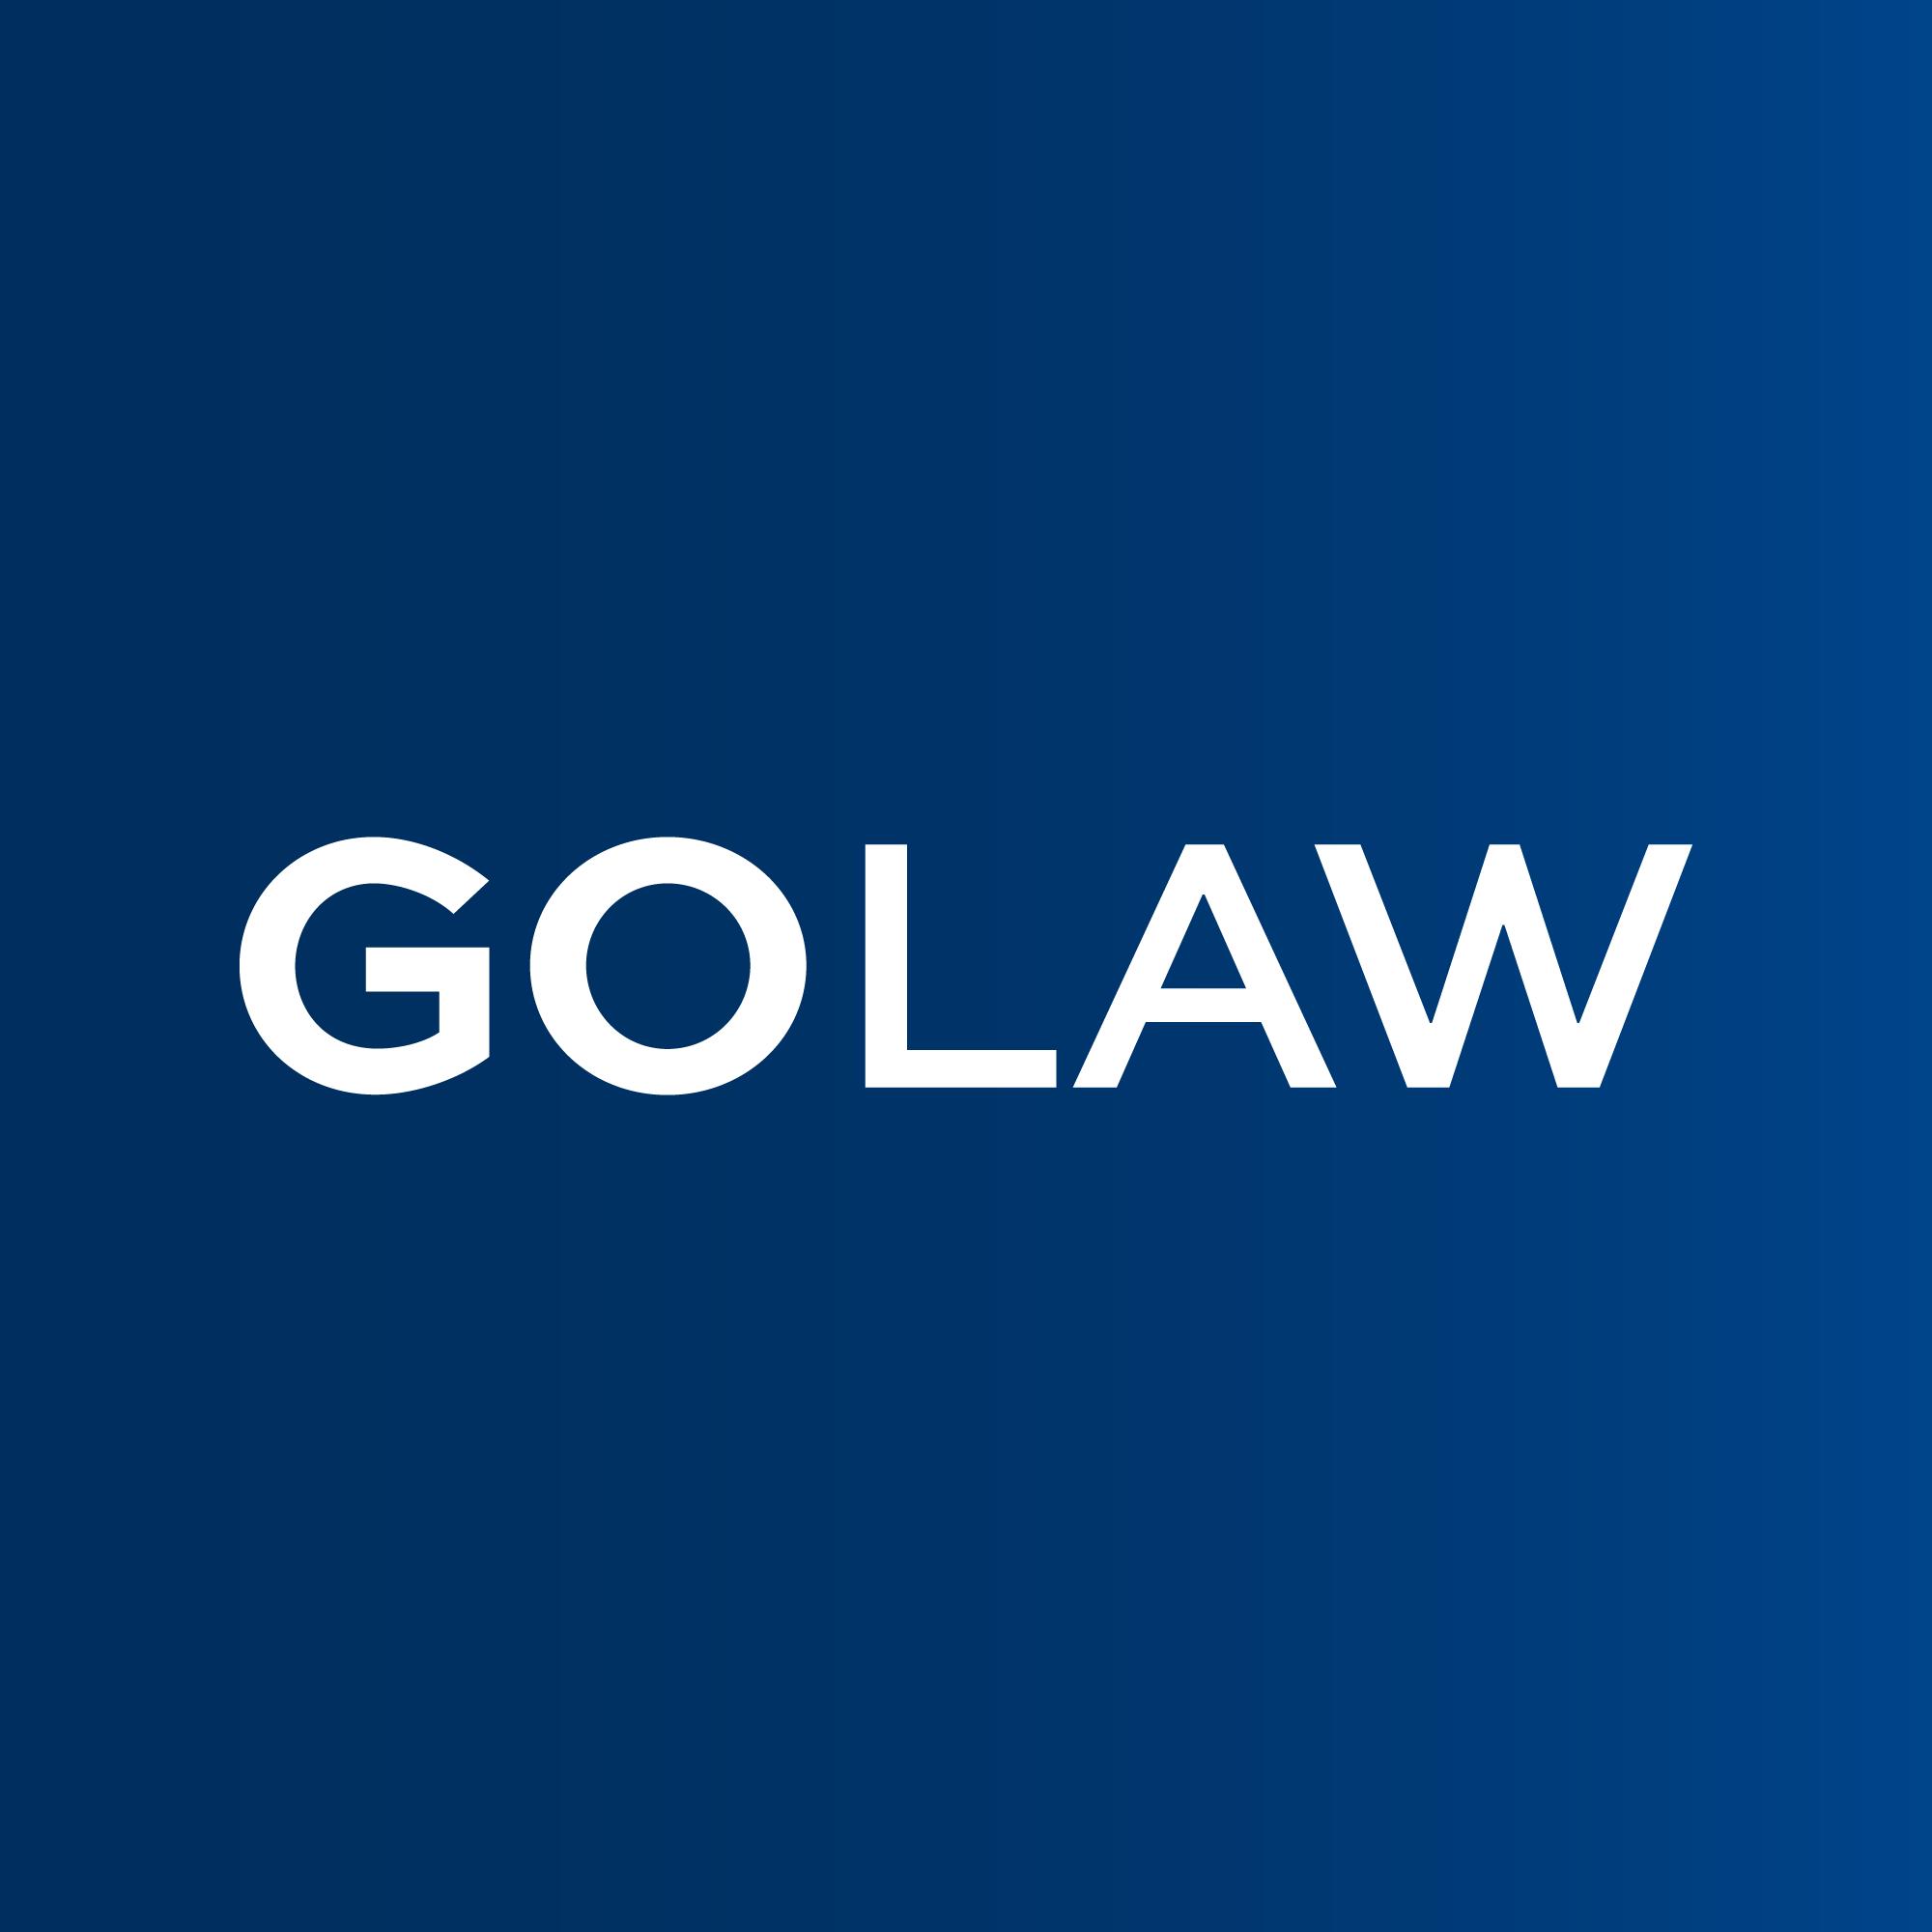 GOLAW